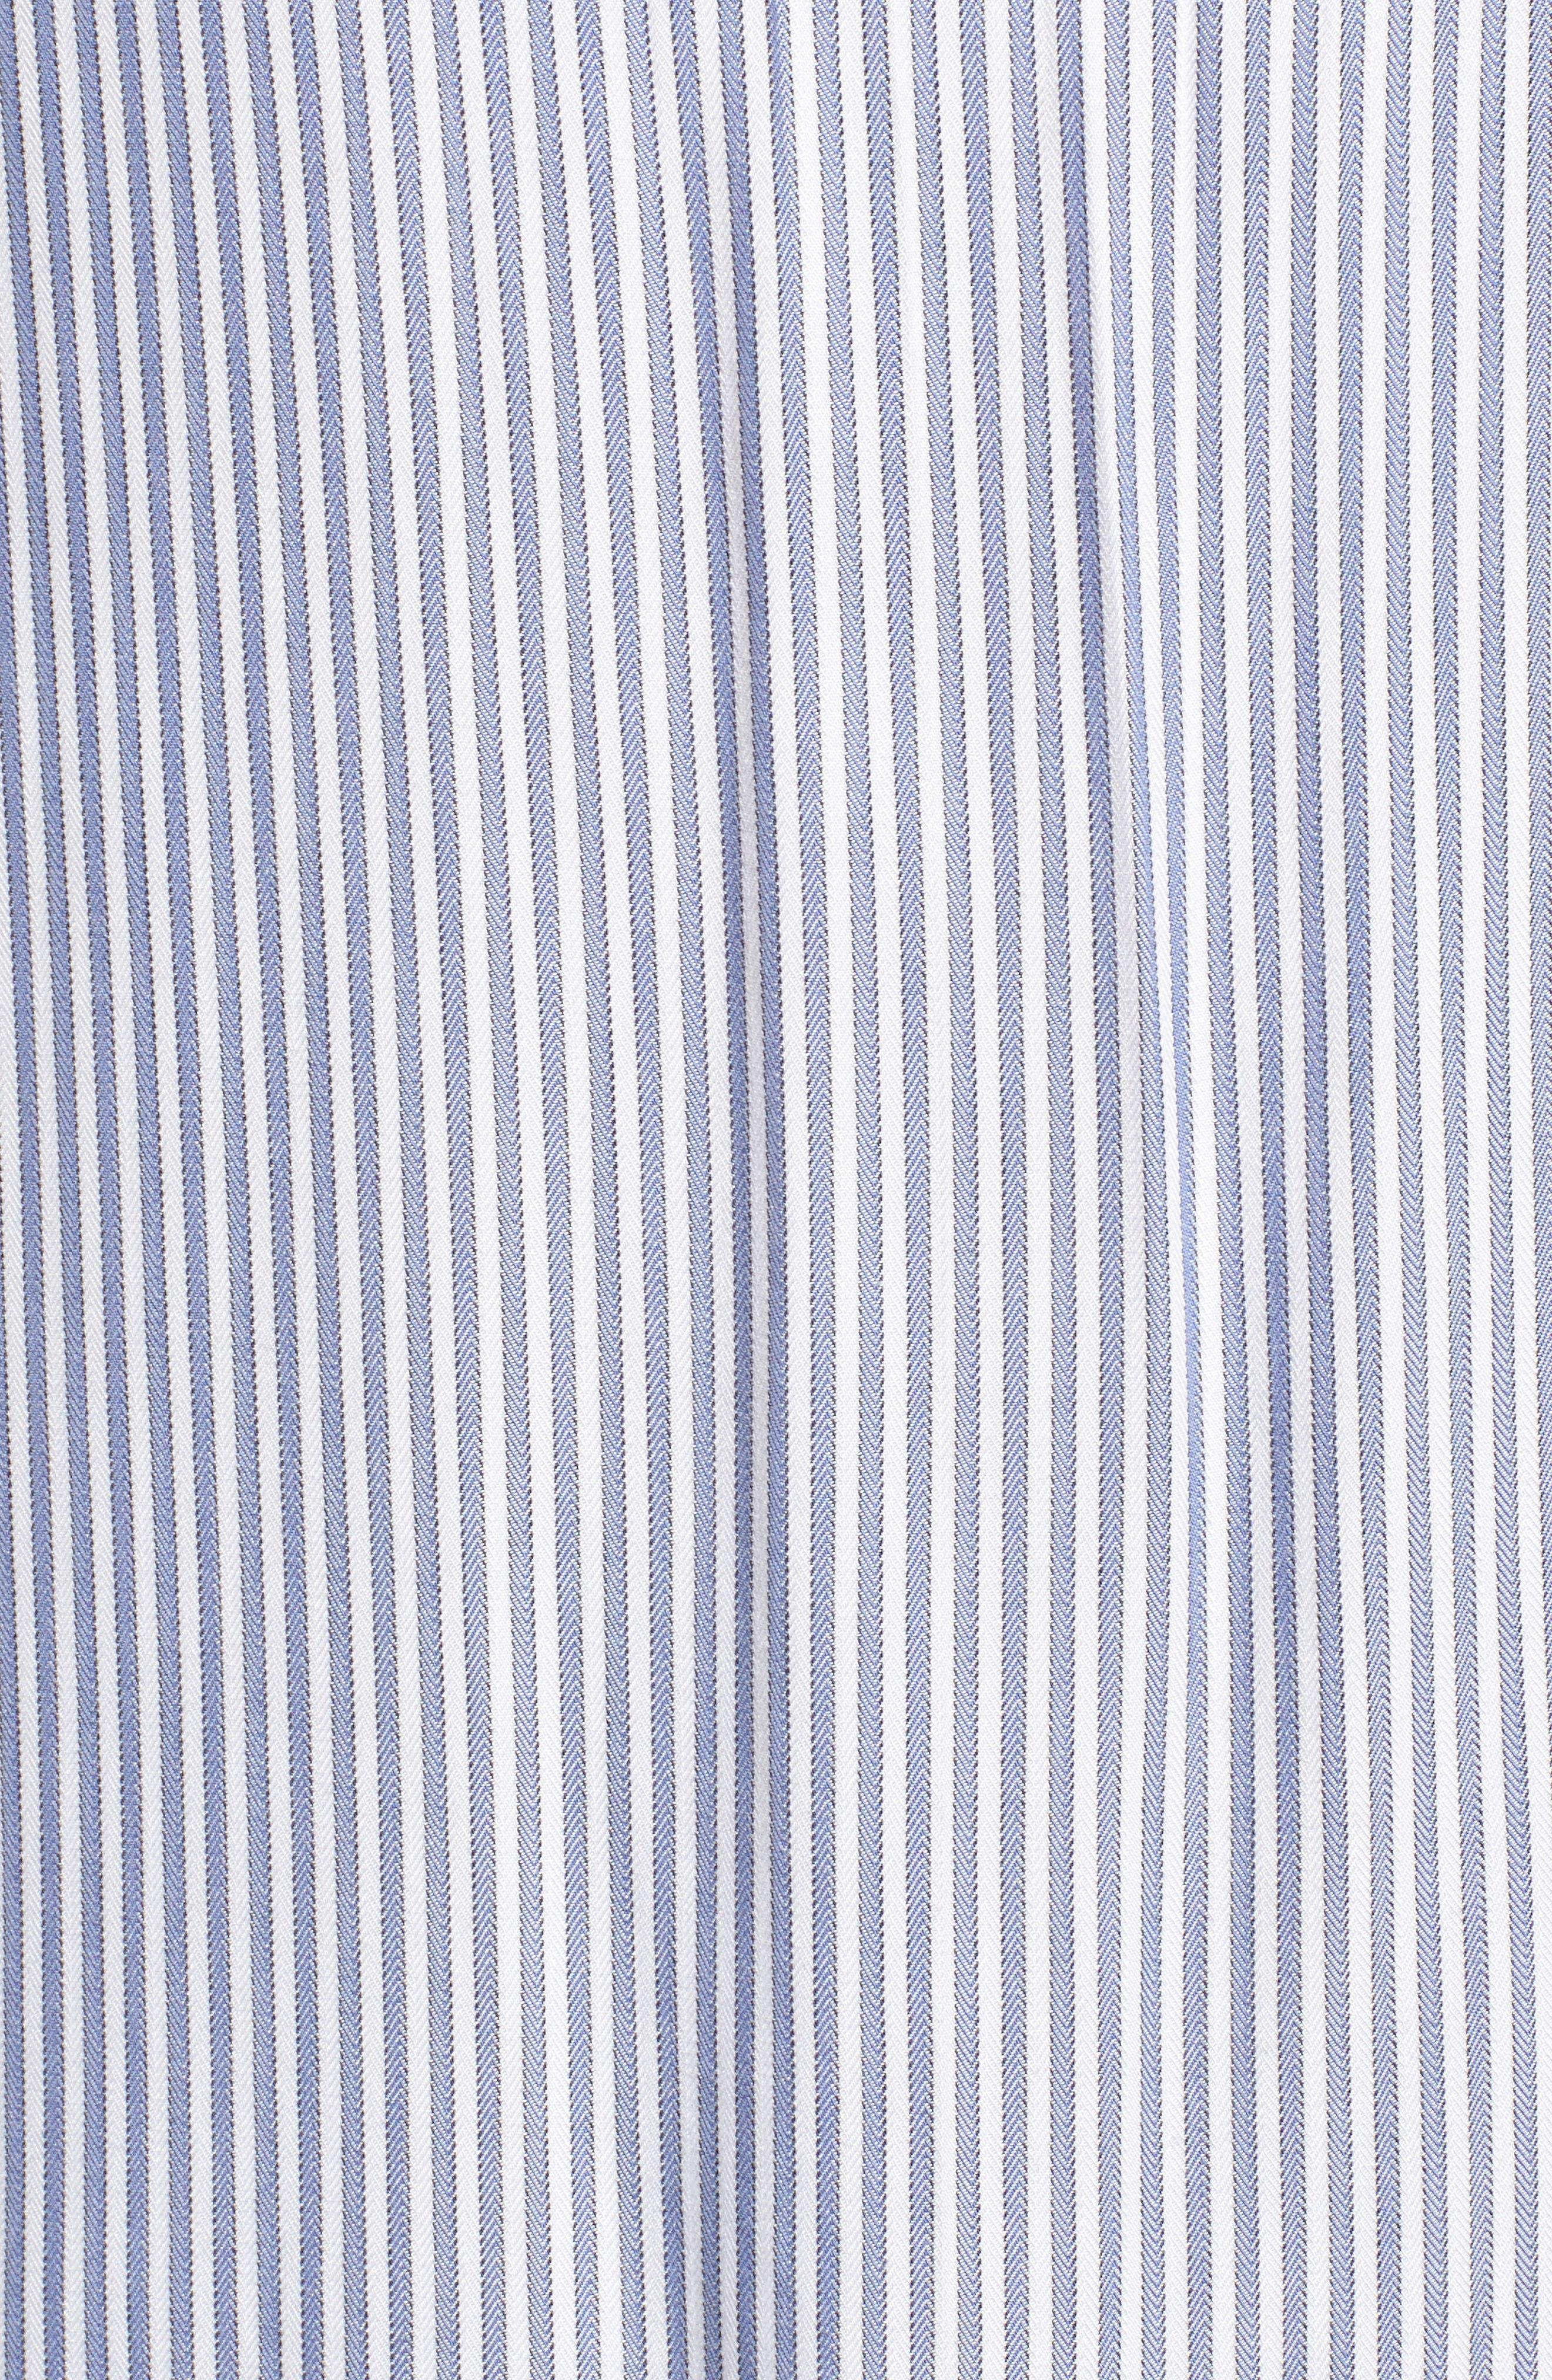 Stripe Ruffle Shirt,                             Alternate thumbnail 5, color,                             White Double Oxford Stripe